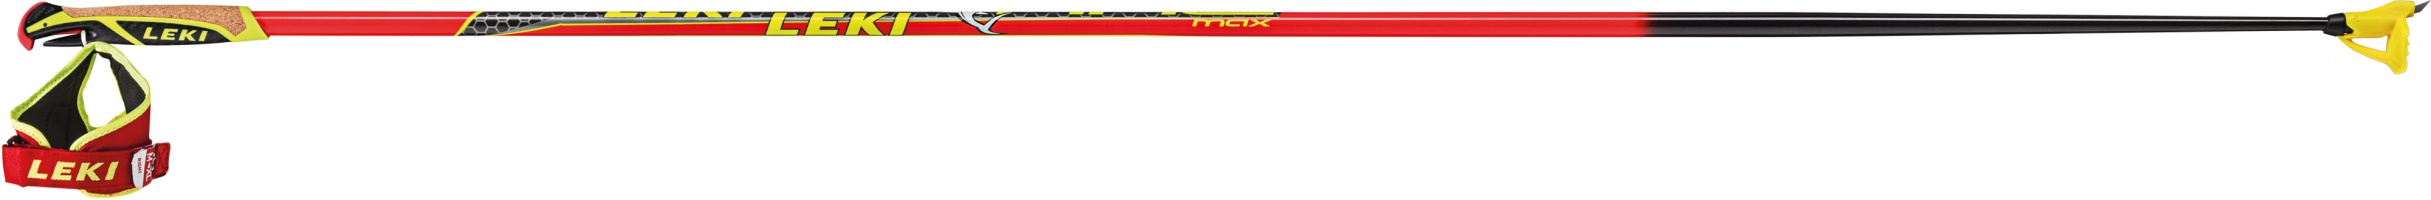 LEKI HRC MAX WORLDCUP (rot)  - Mod.2020/21 Langlaufstock